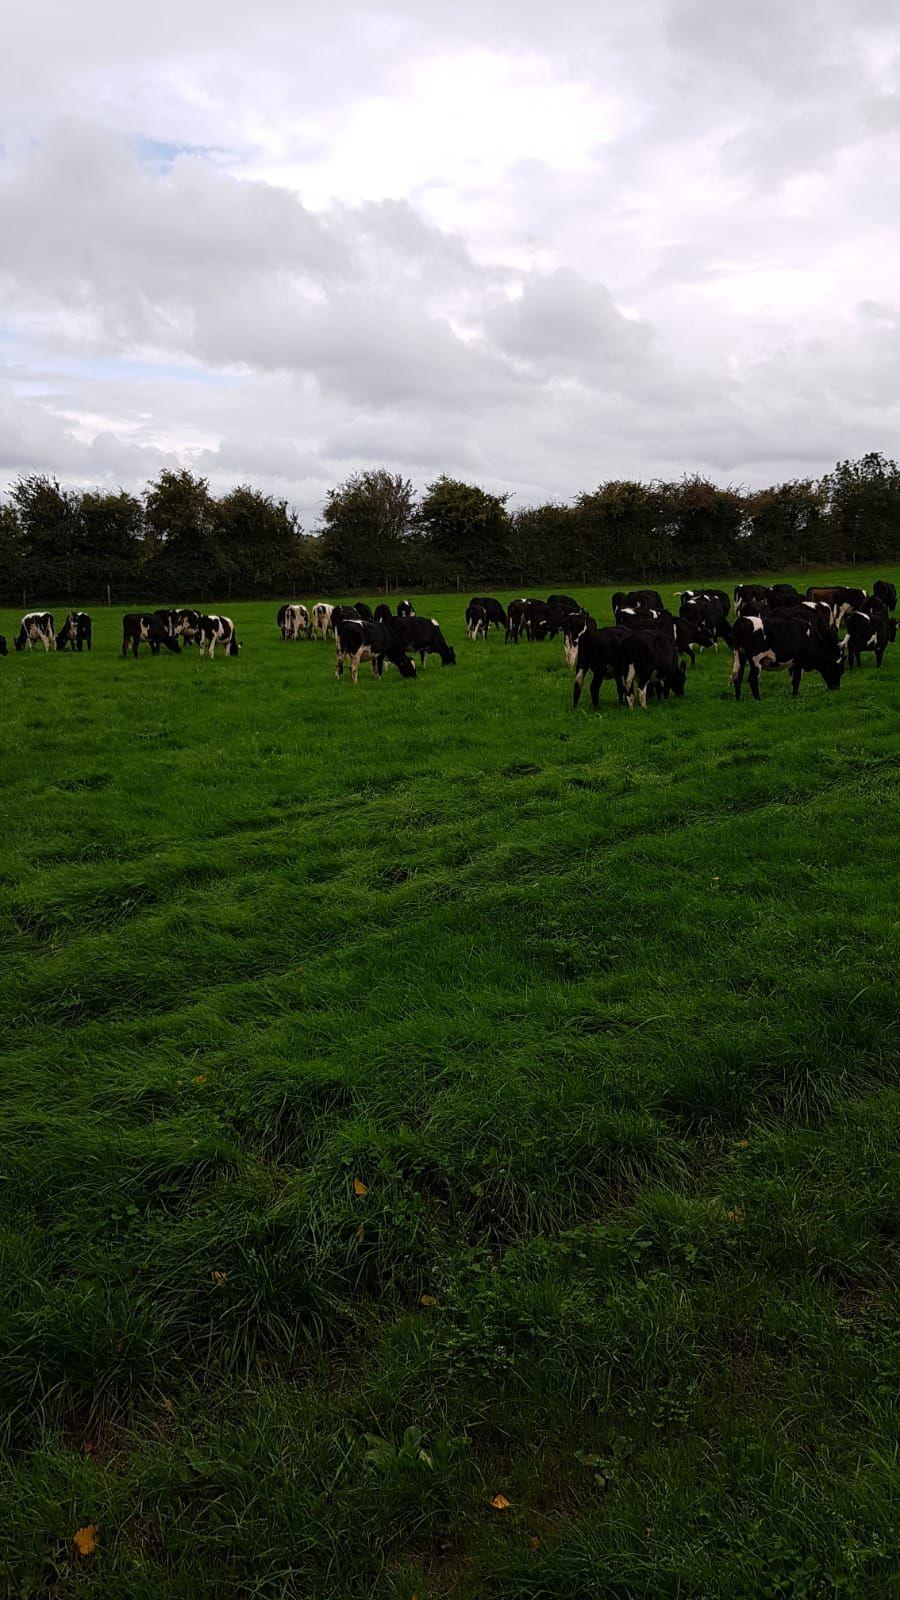 Cows, grass